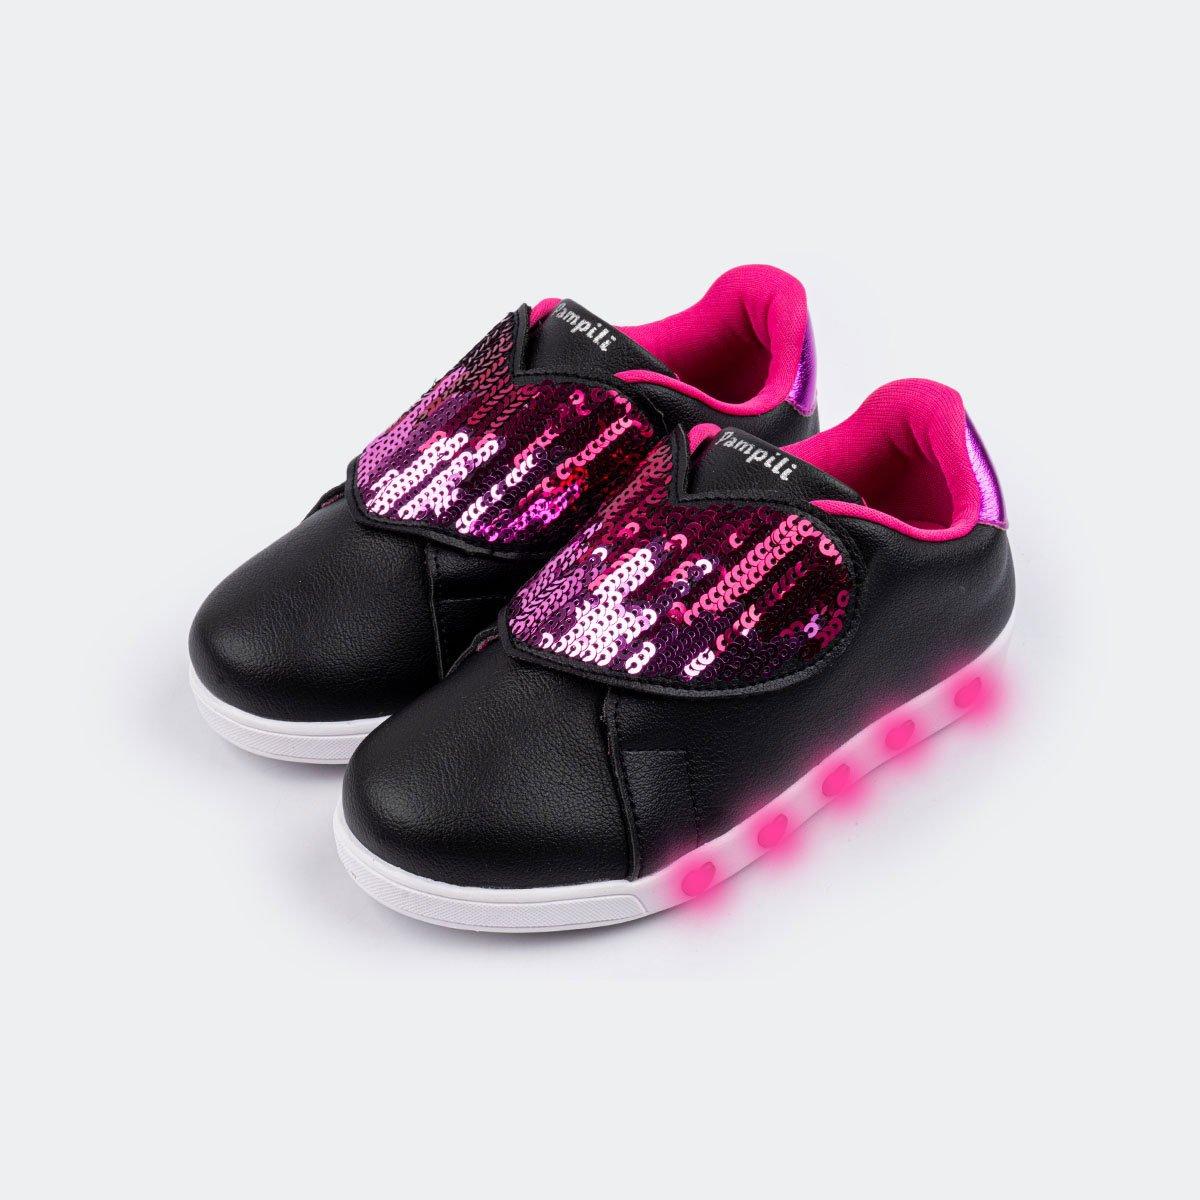 Tênis Pampili Infantil Sneaker Led Paetê - 165.147